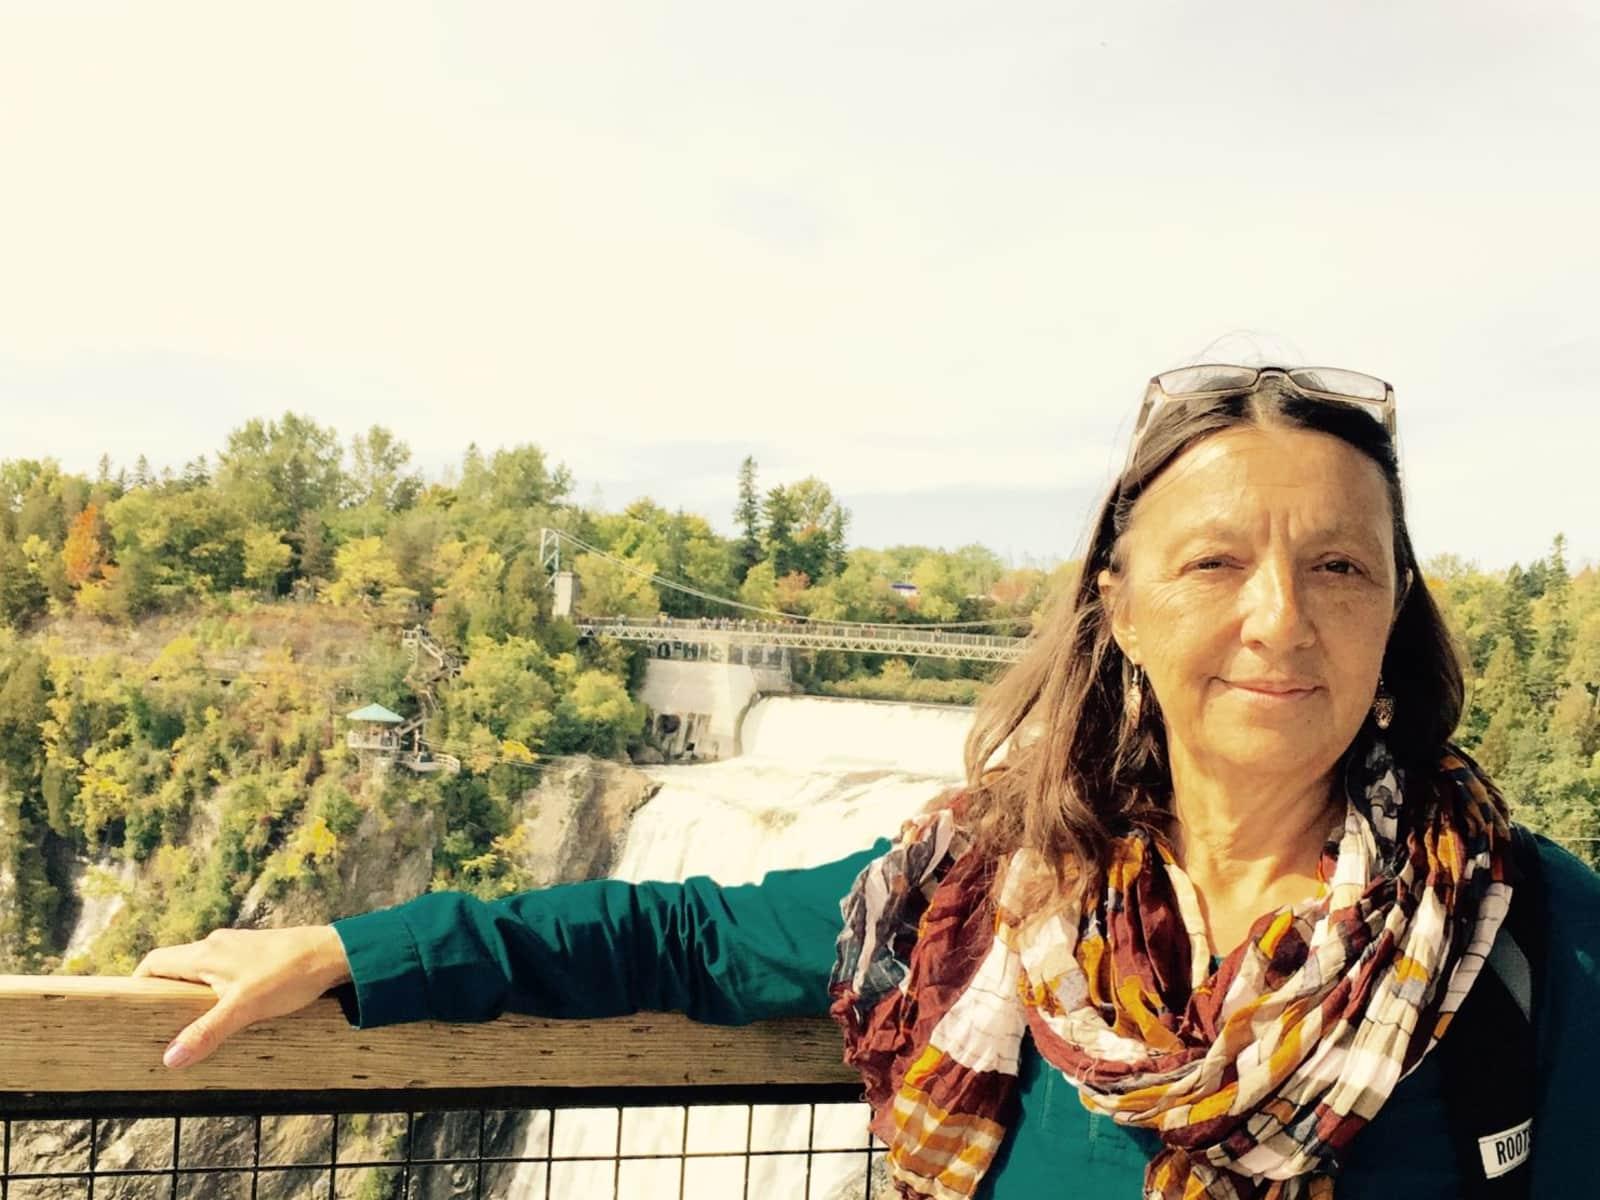 Brenda from Dauphin, Manitoba, Canada